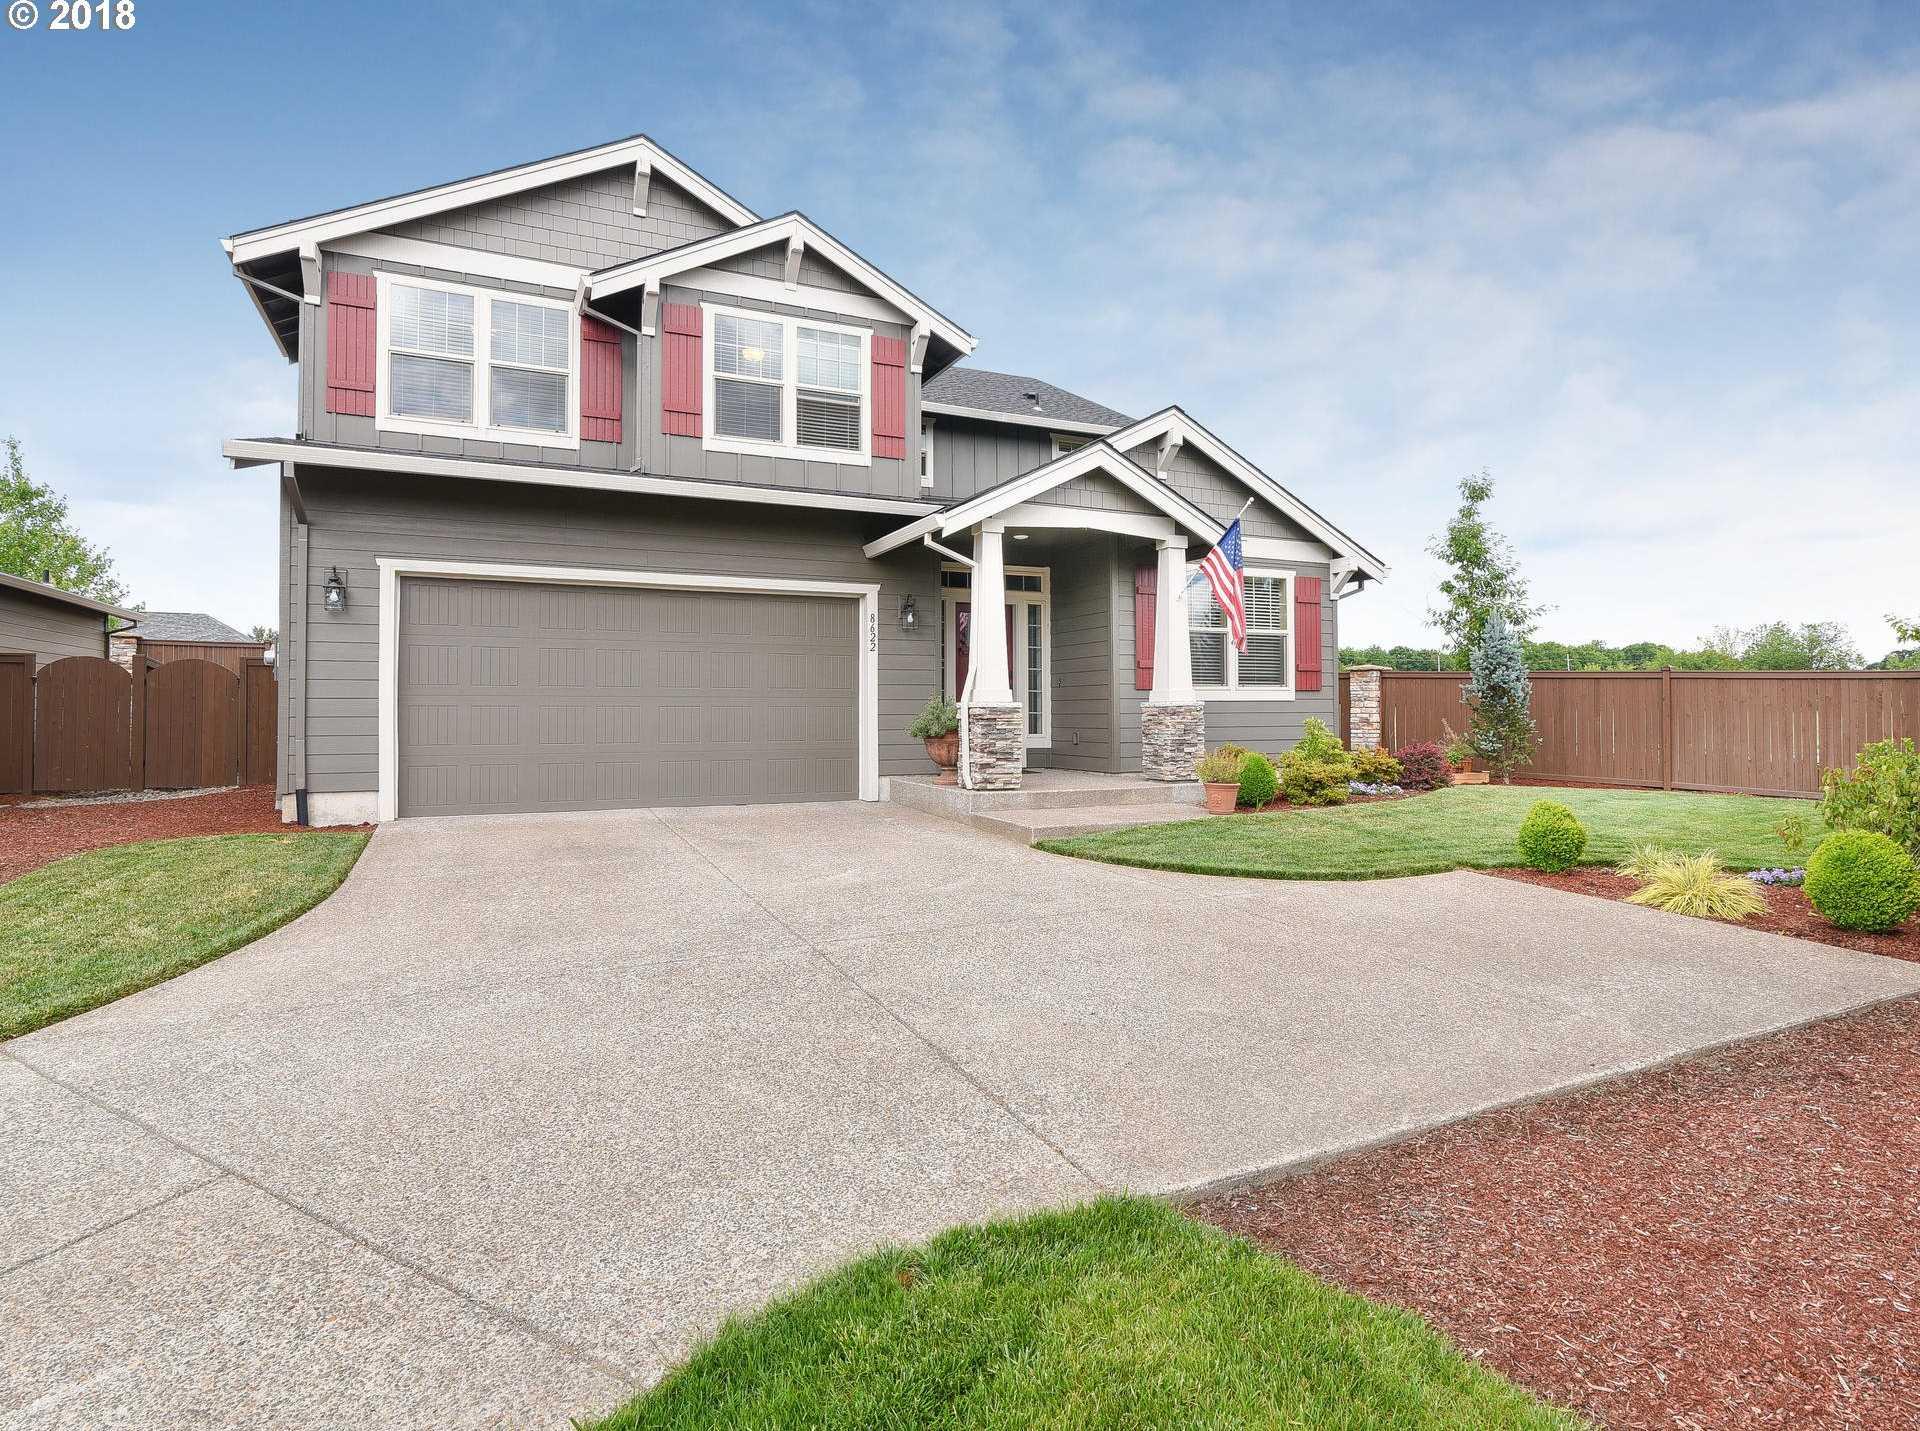 $485,000 - 5Br/3Ba -  for Sale in Wilsonville